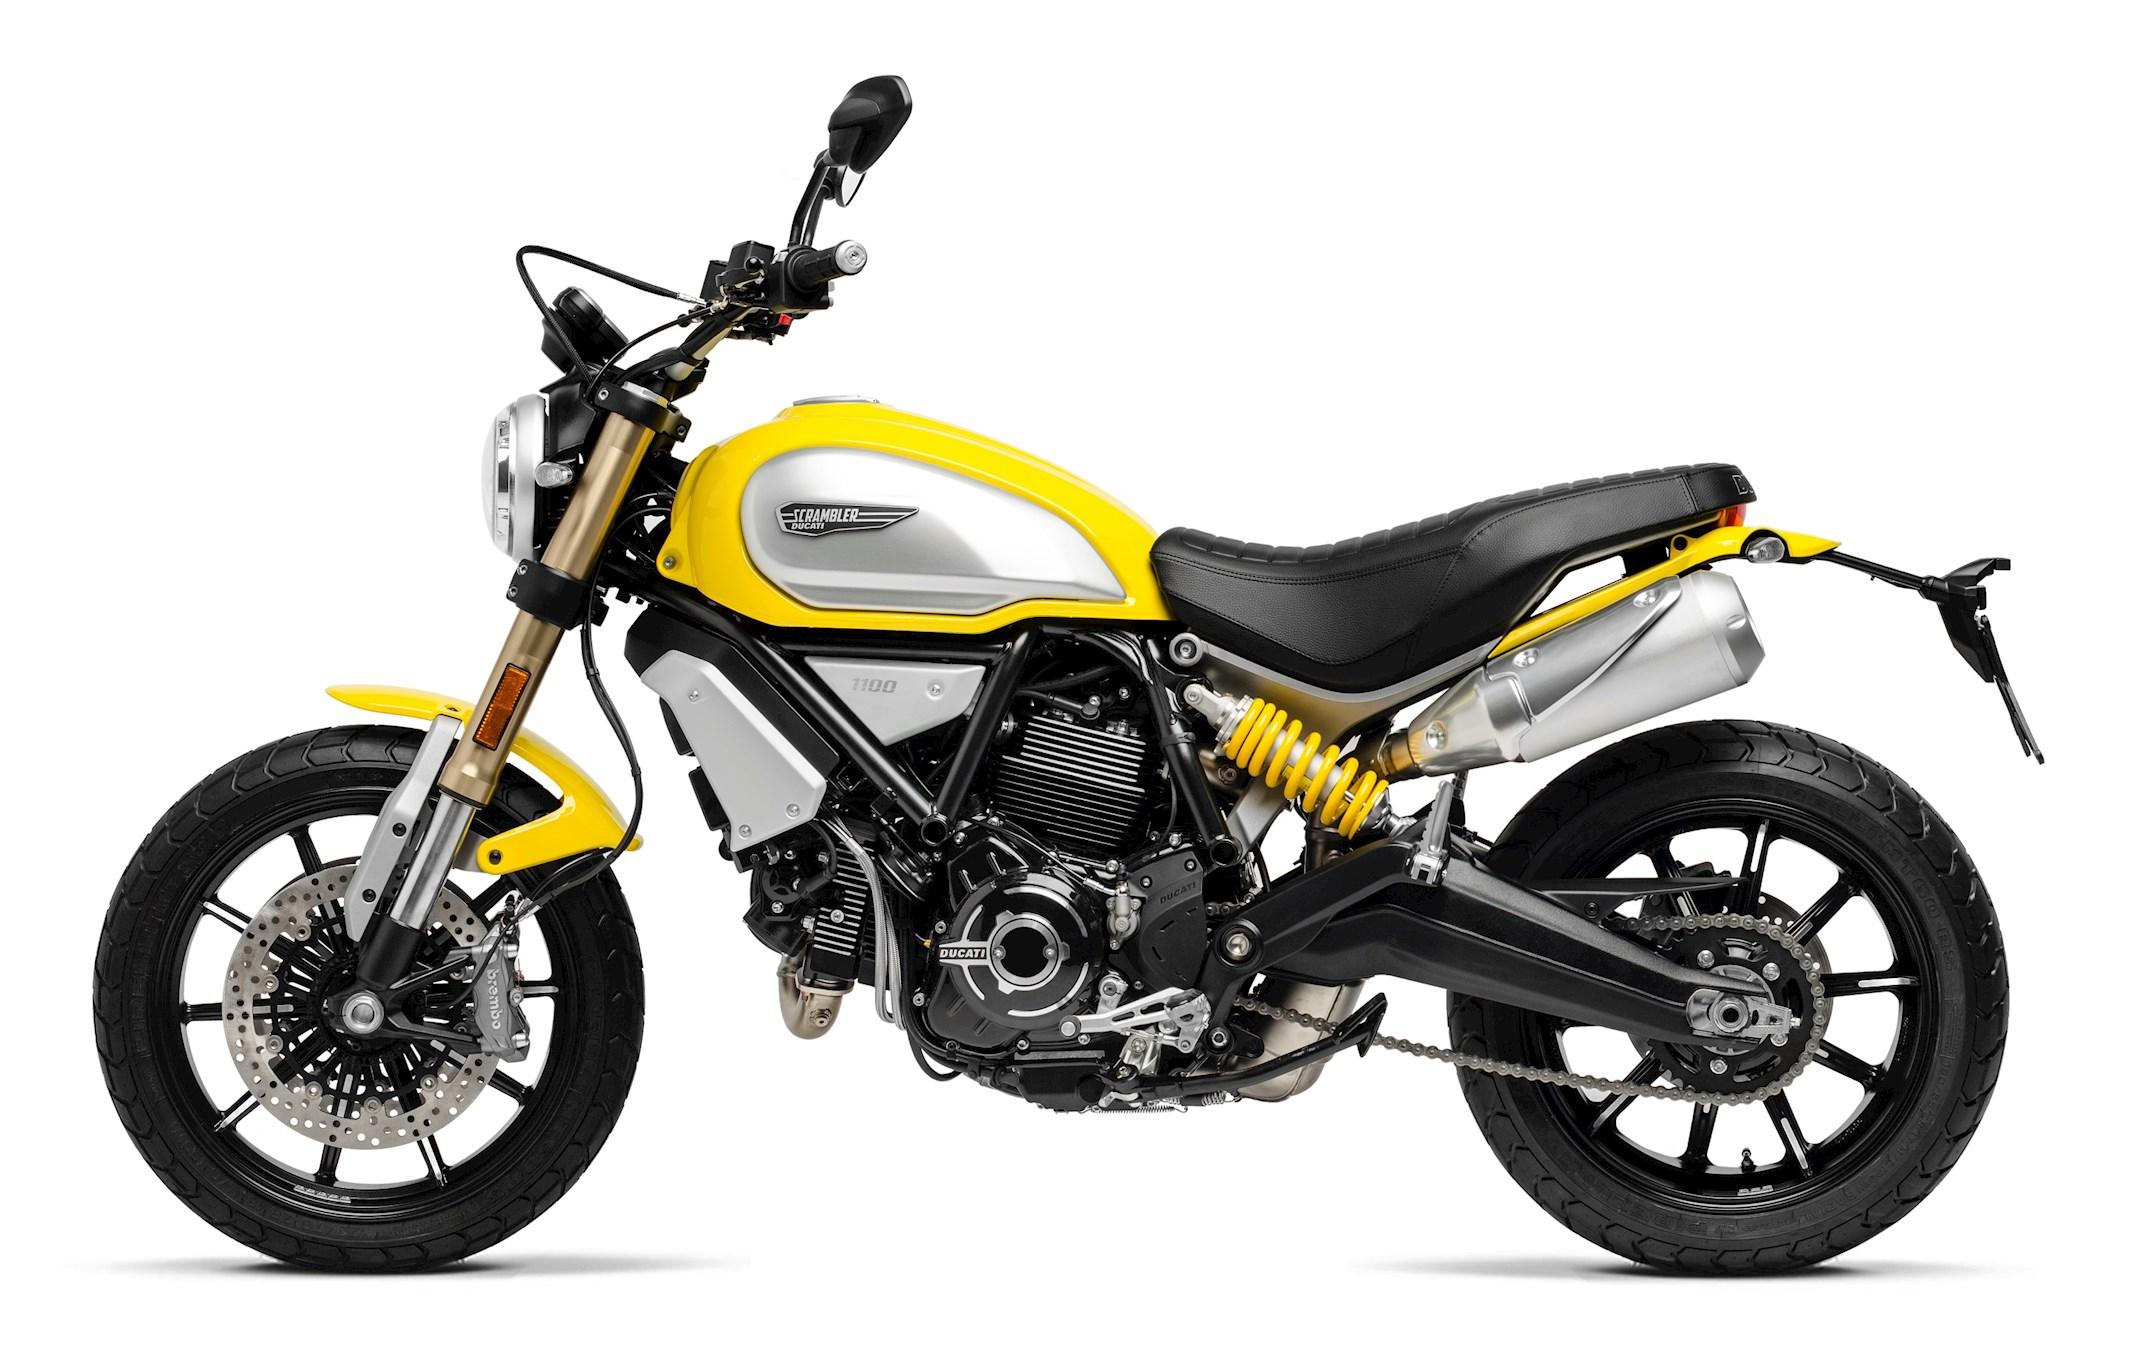 МОТОЦИКЛ DUCATI SCRAMBLER 1100  Артмото - купить квадроцикл в украине и харькове, мотоцикл, снегоход, скутер, мопед, электромобиль